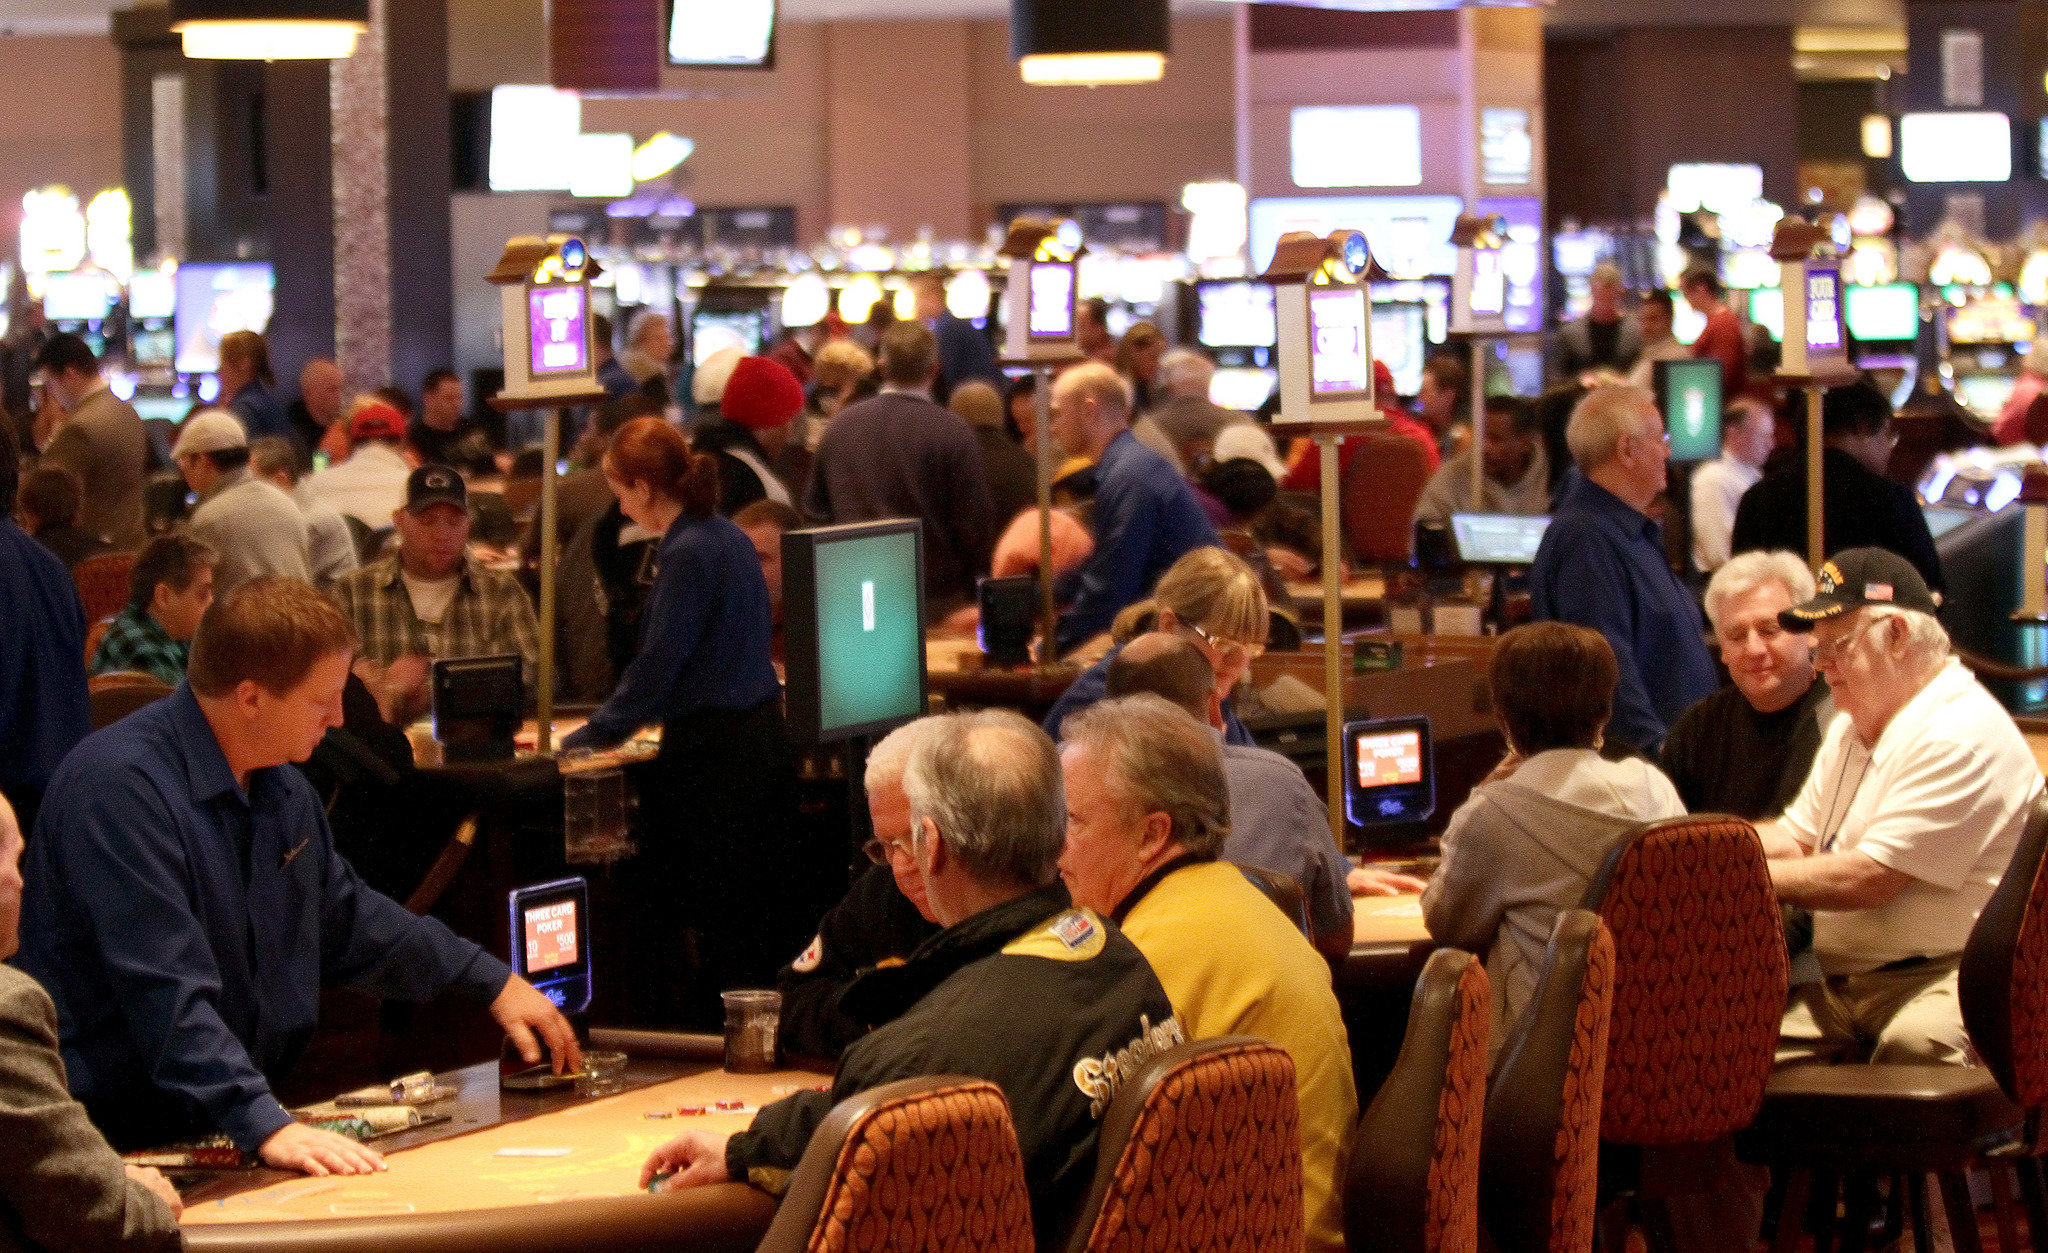 Table games at the rivers casino casino baseball bat scene